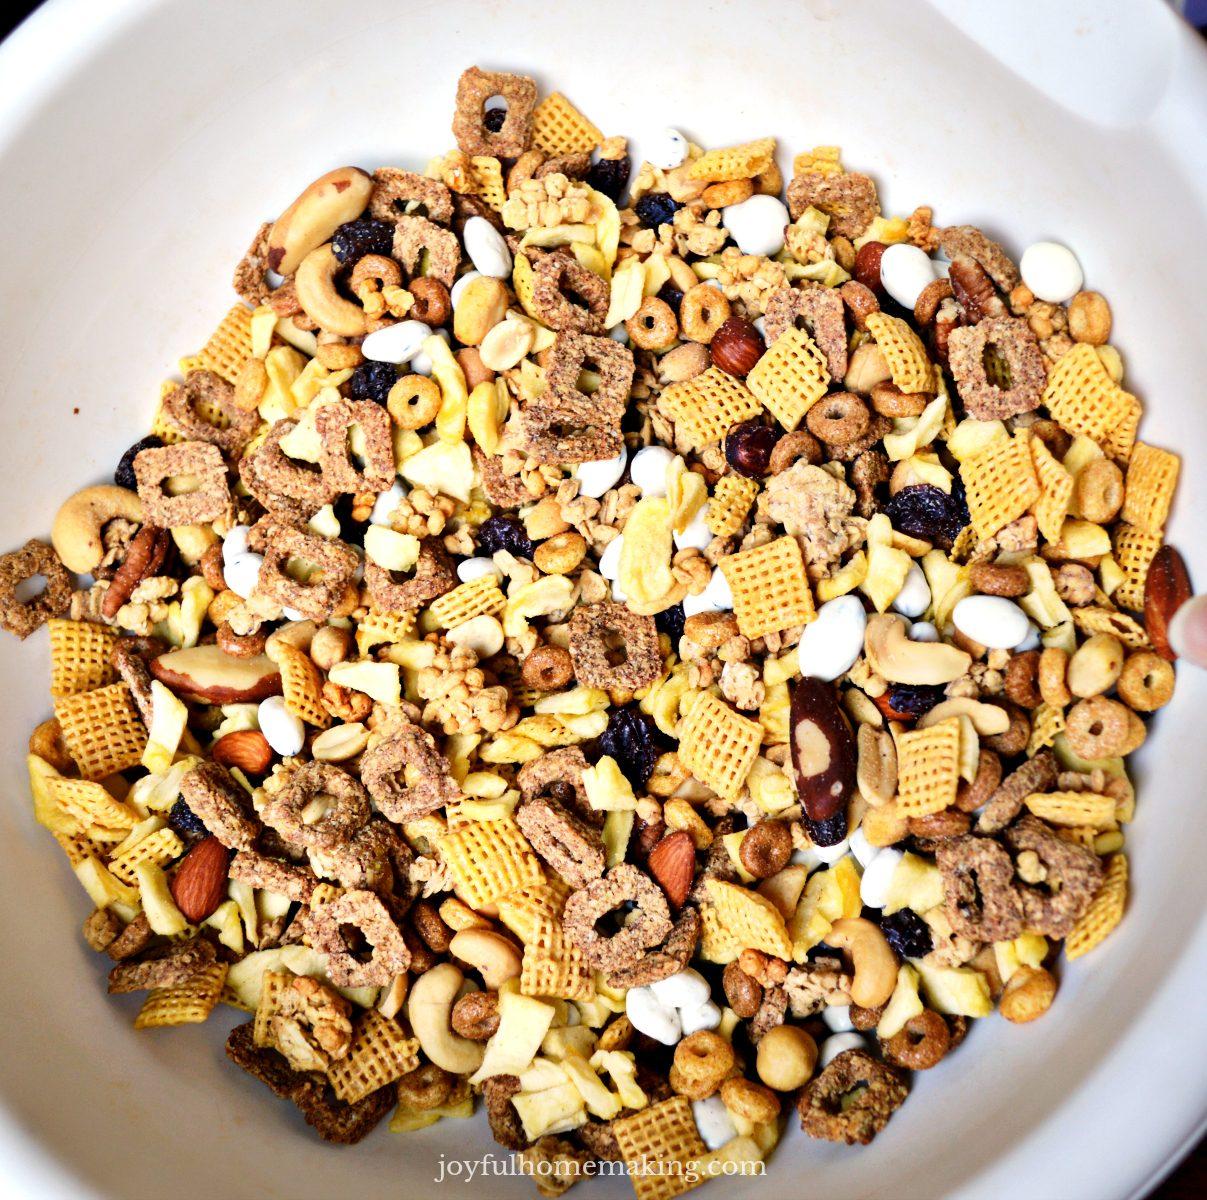 breakfast snack packs, Breakfast To-Go Packs, Joyful Homemaking